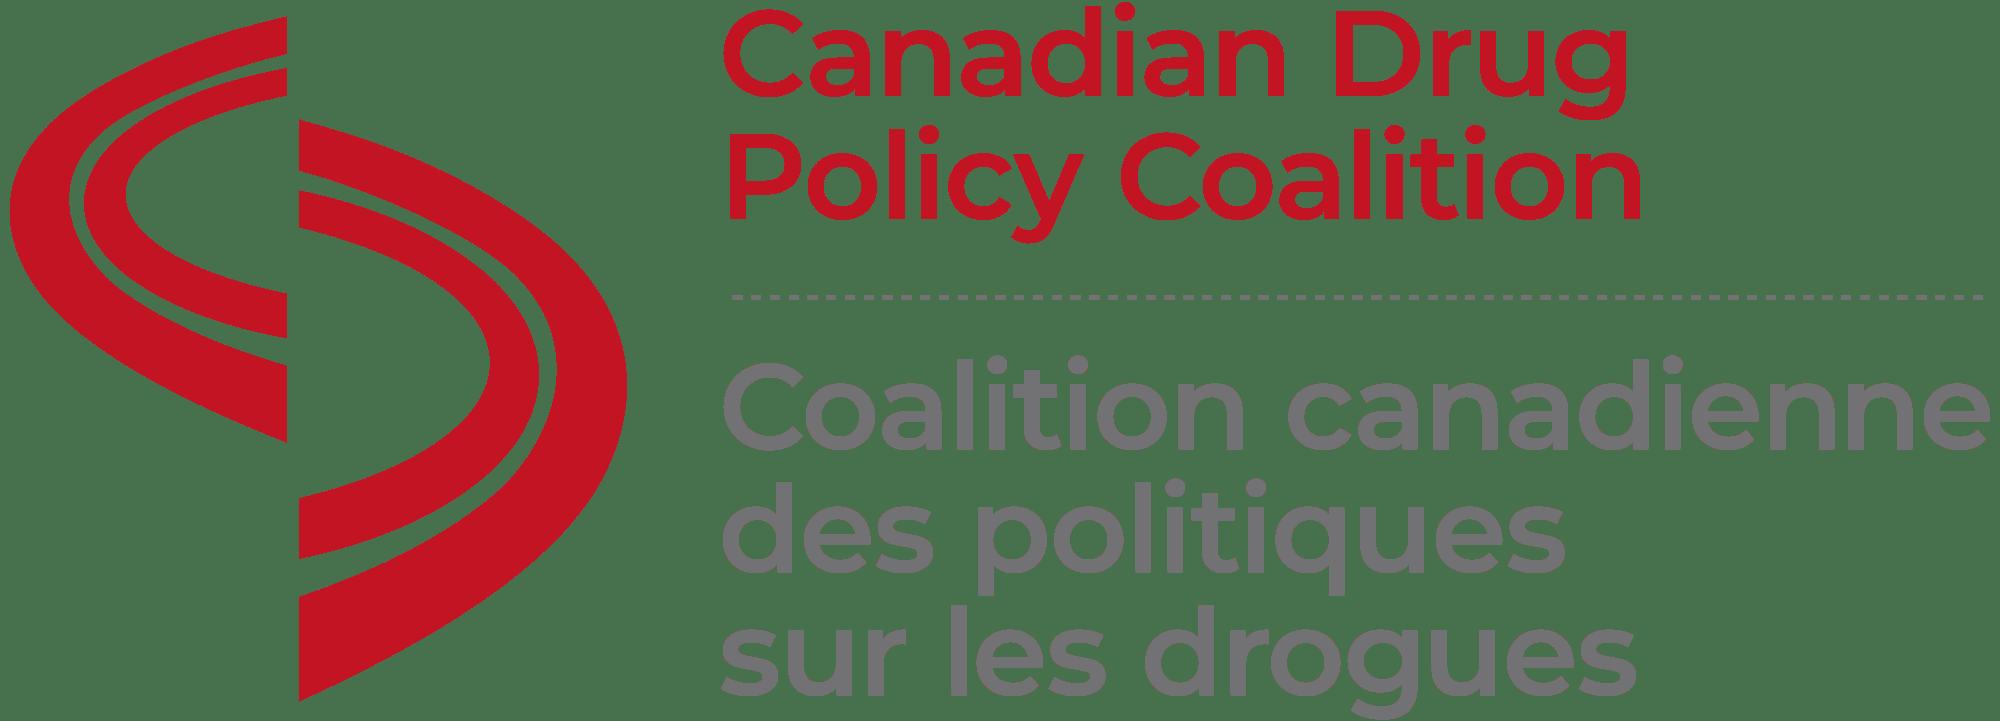 CDPC logo | Canadian Drug Policy Coalition